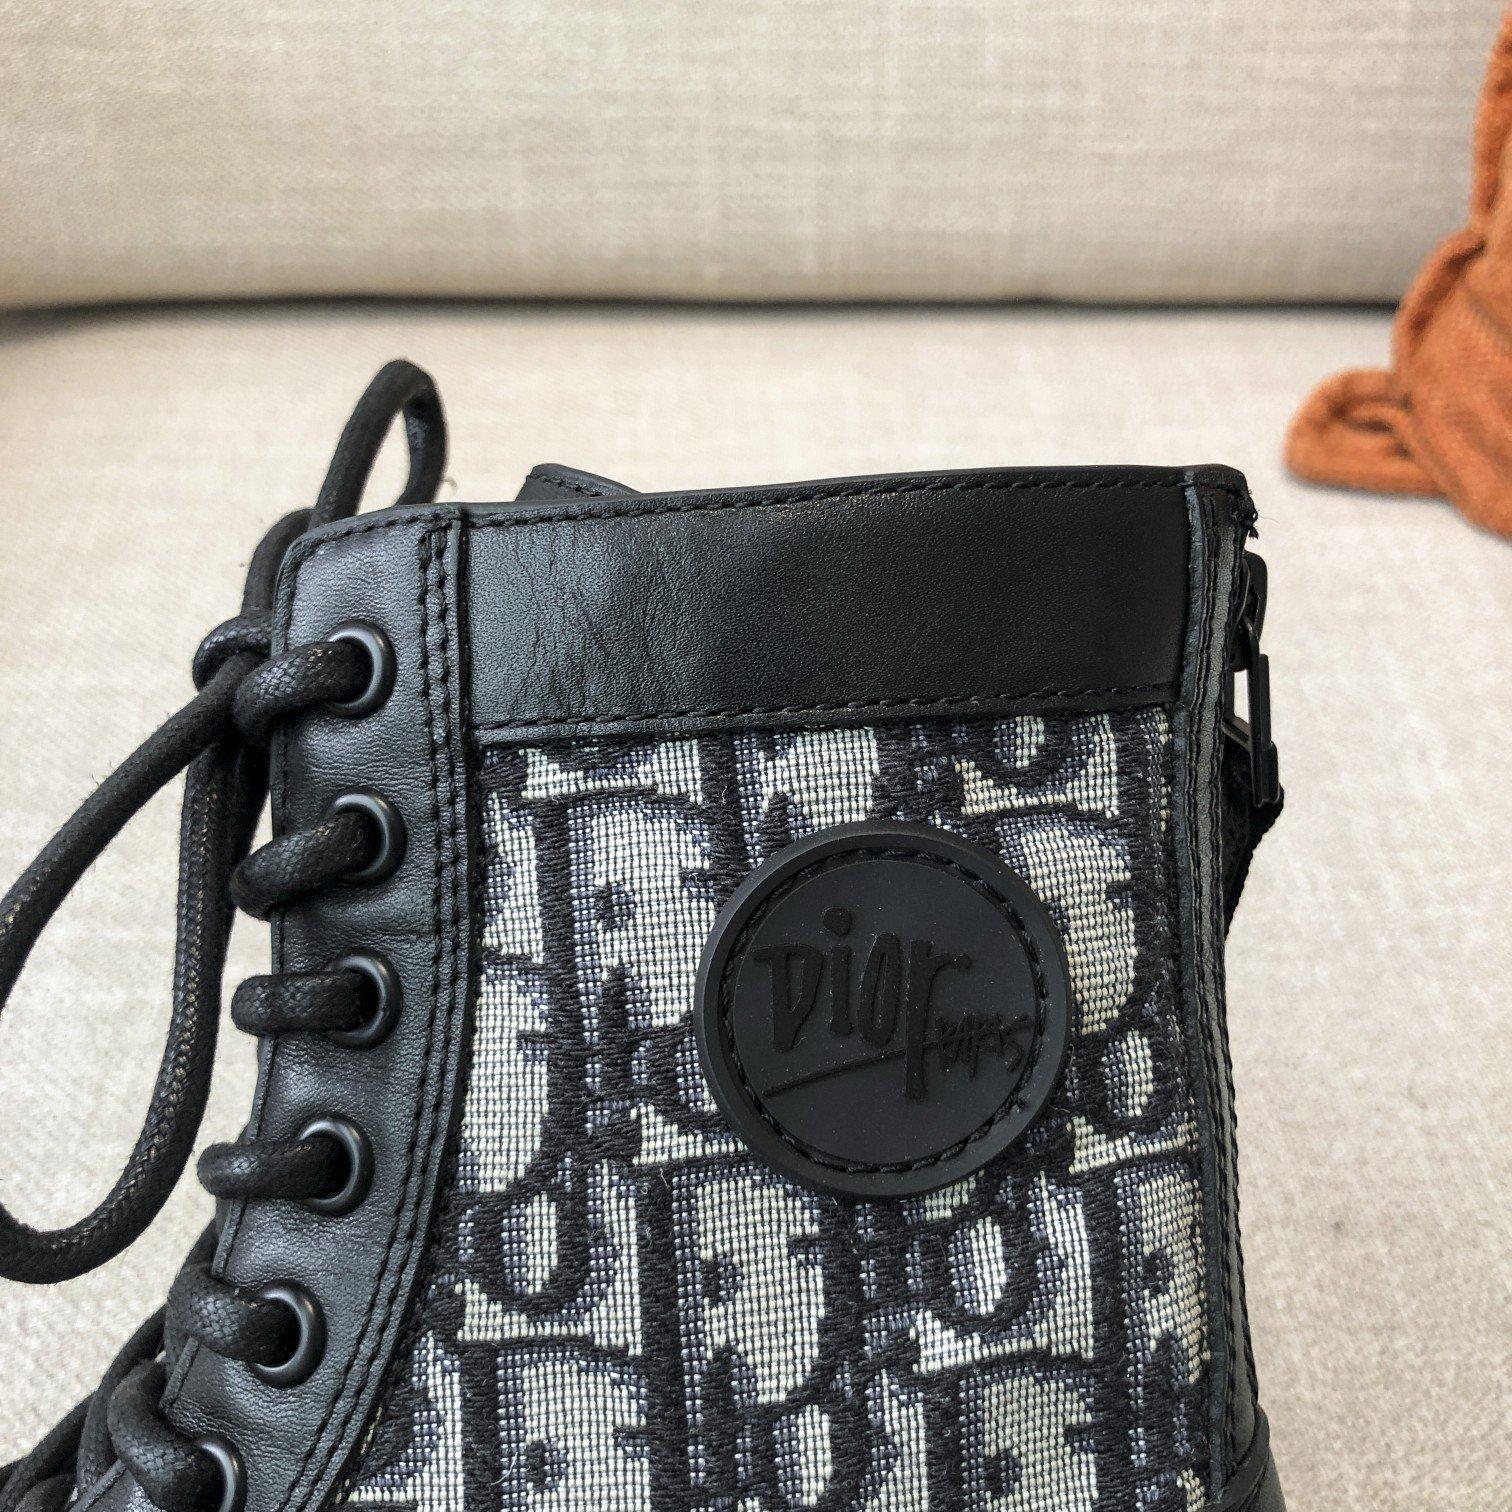 Dior高版本情侣 款2020ss秋冬新款字母厚底系带机车靴,秋冬T台走秀同款(图7)